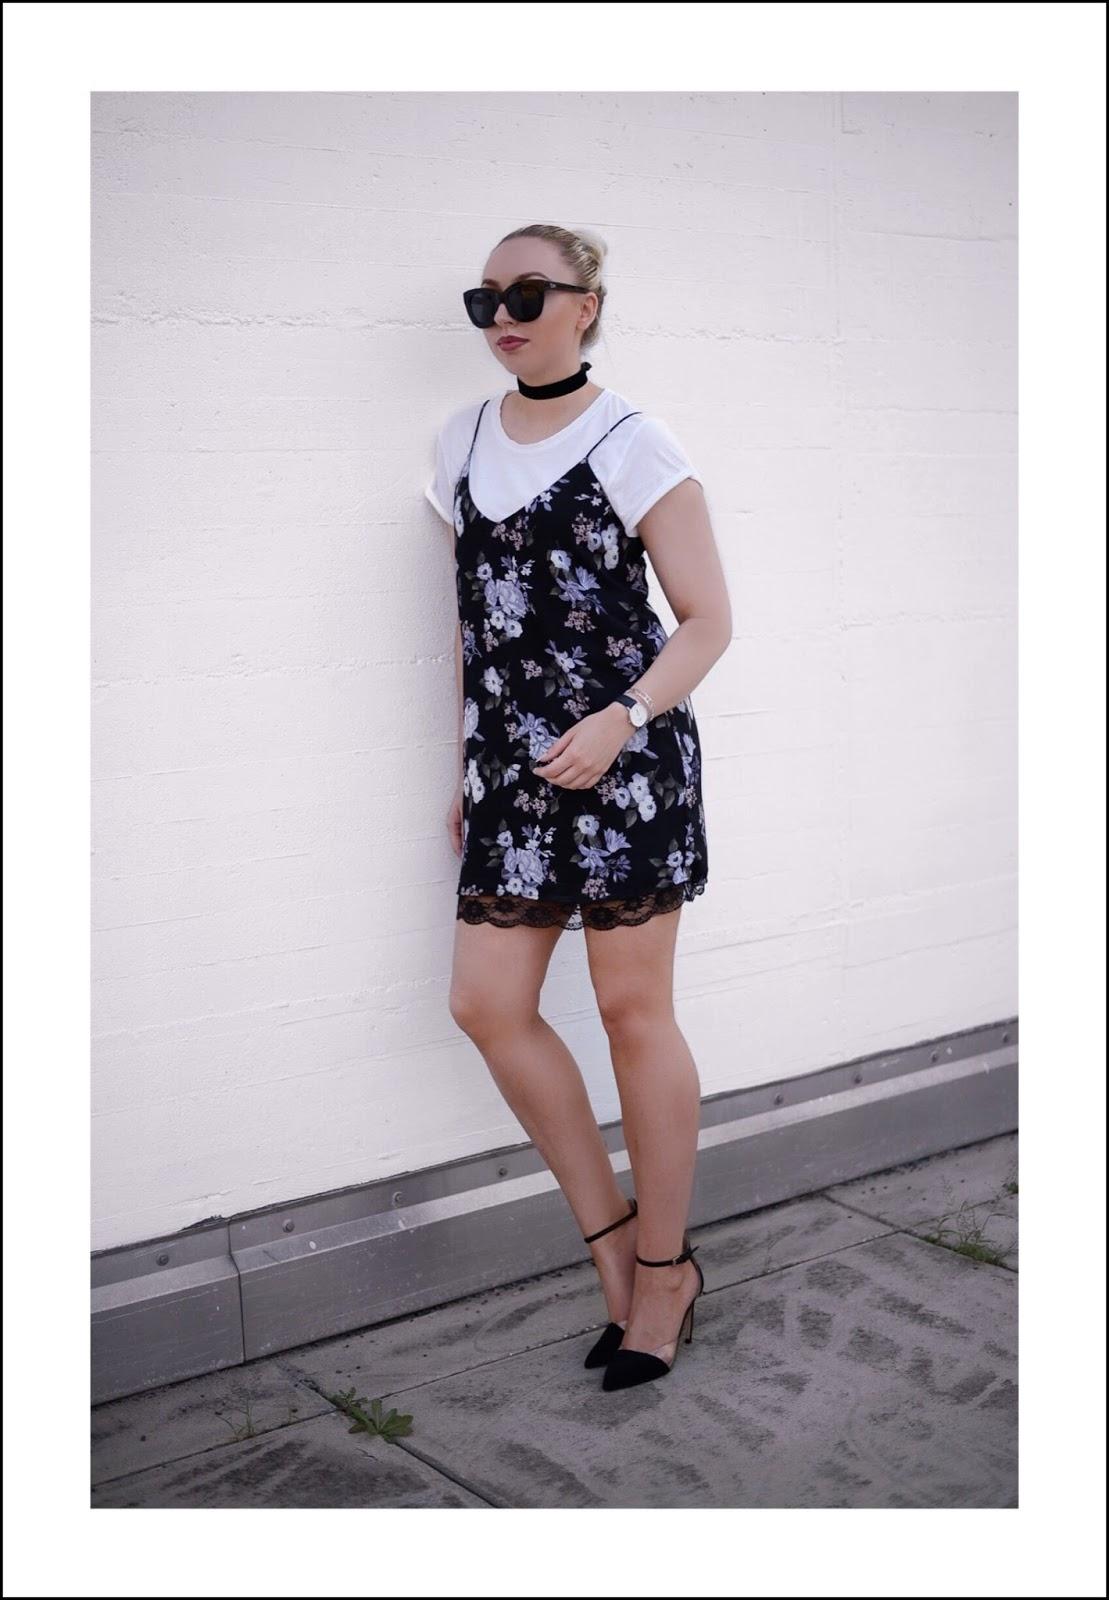 lace slip dress over shirt